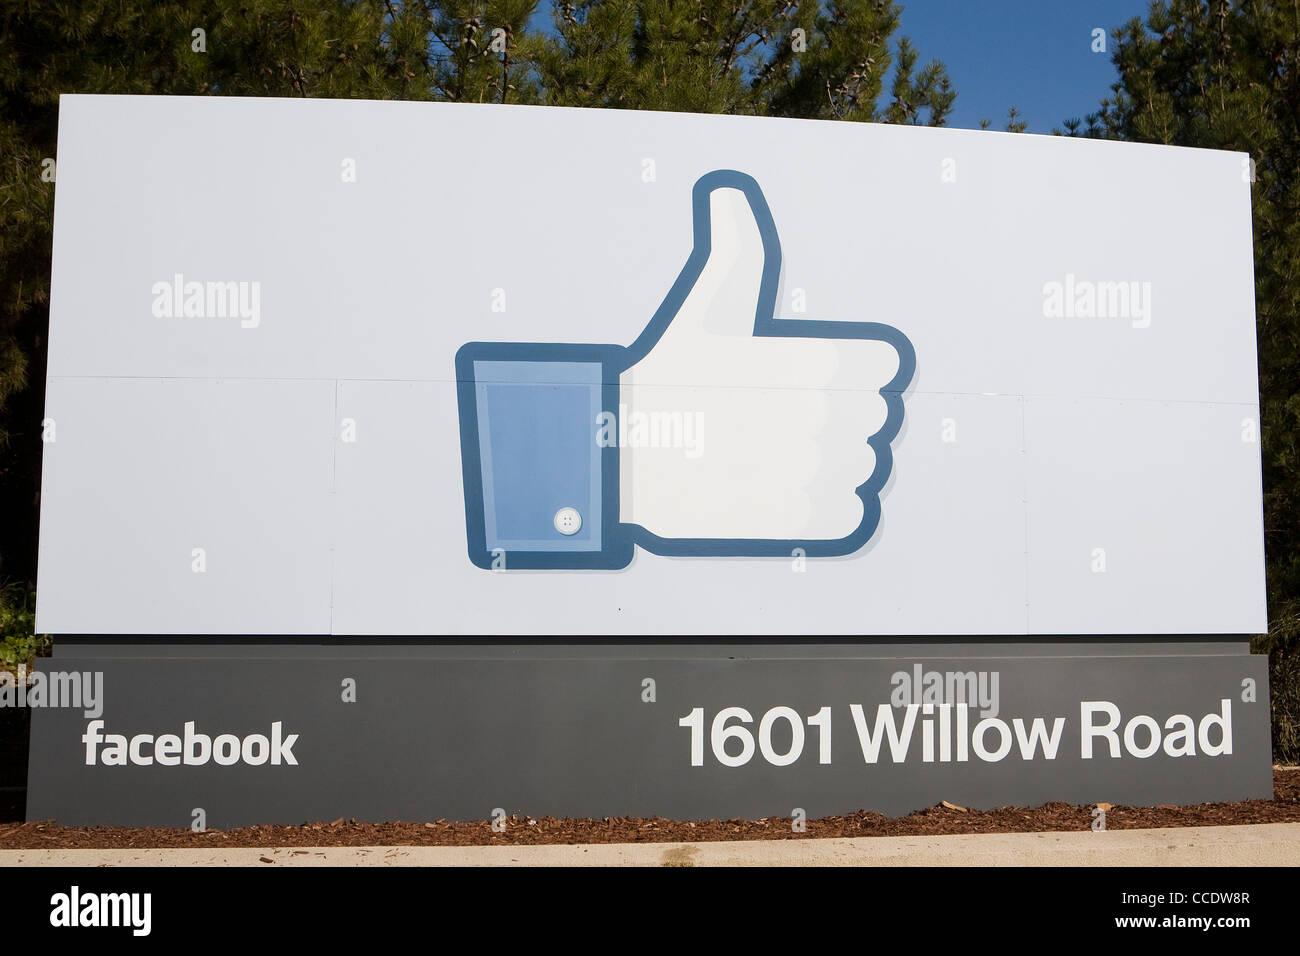 Facebook Sign 1601 Willow Road Stock Photos & Facebook Sign 1601